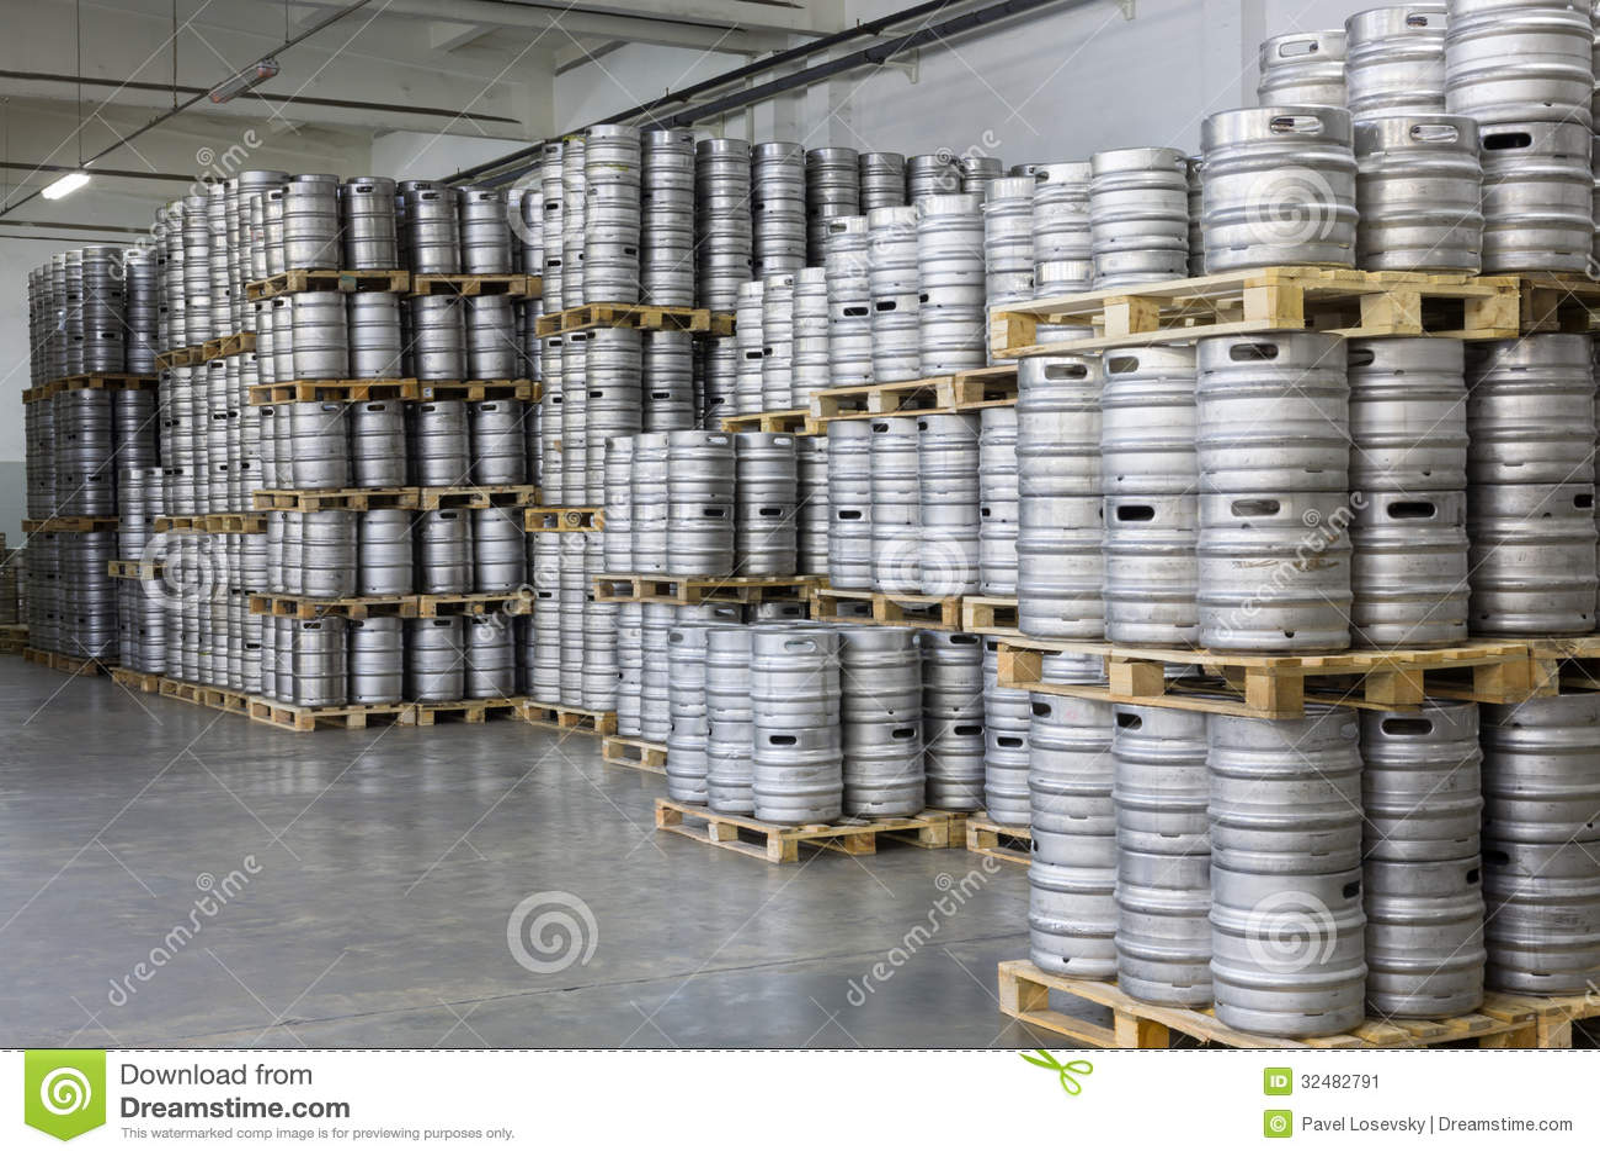 Pallets Of Beer Kegs In Stock Brewery Ochakovo Editorial